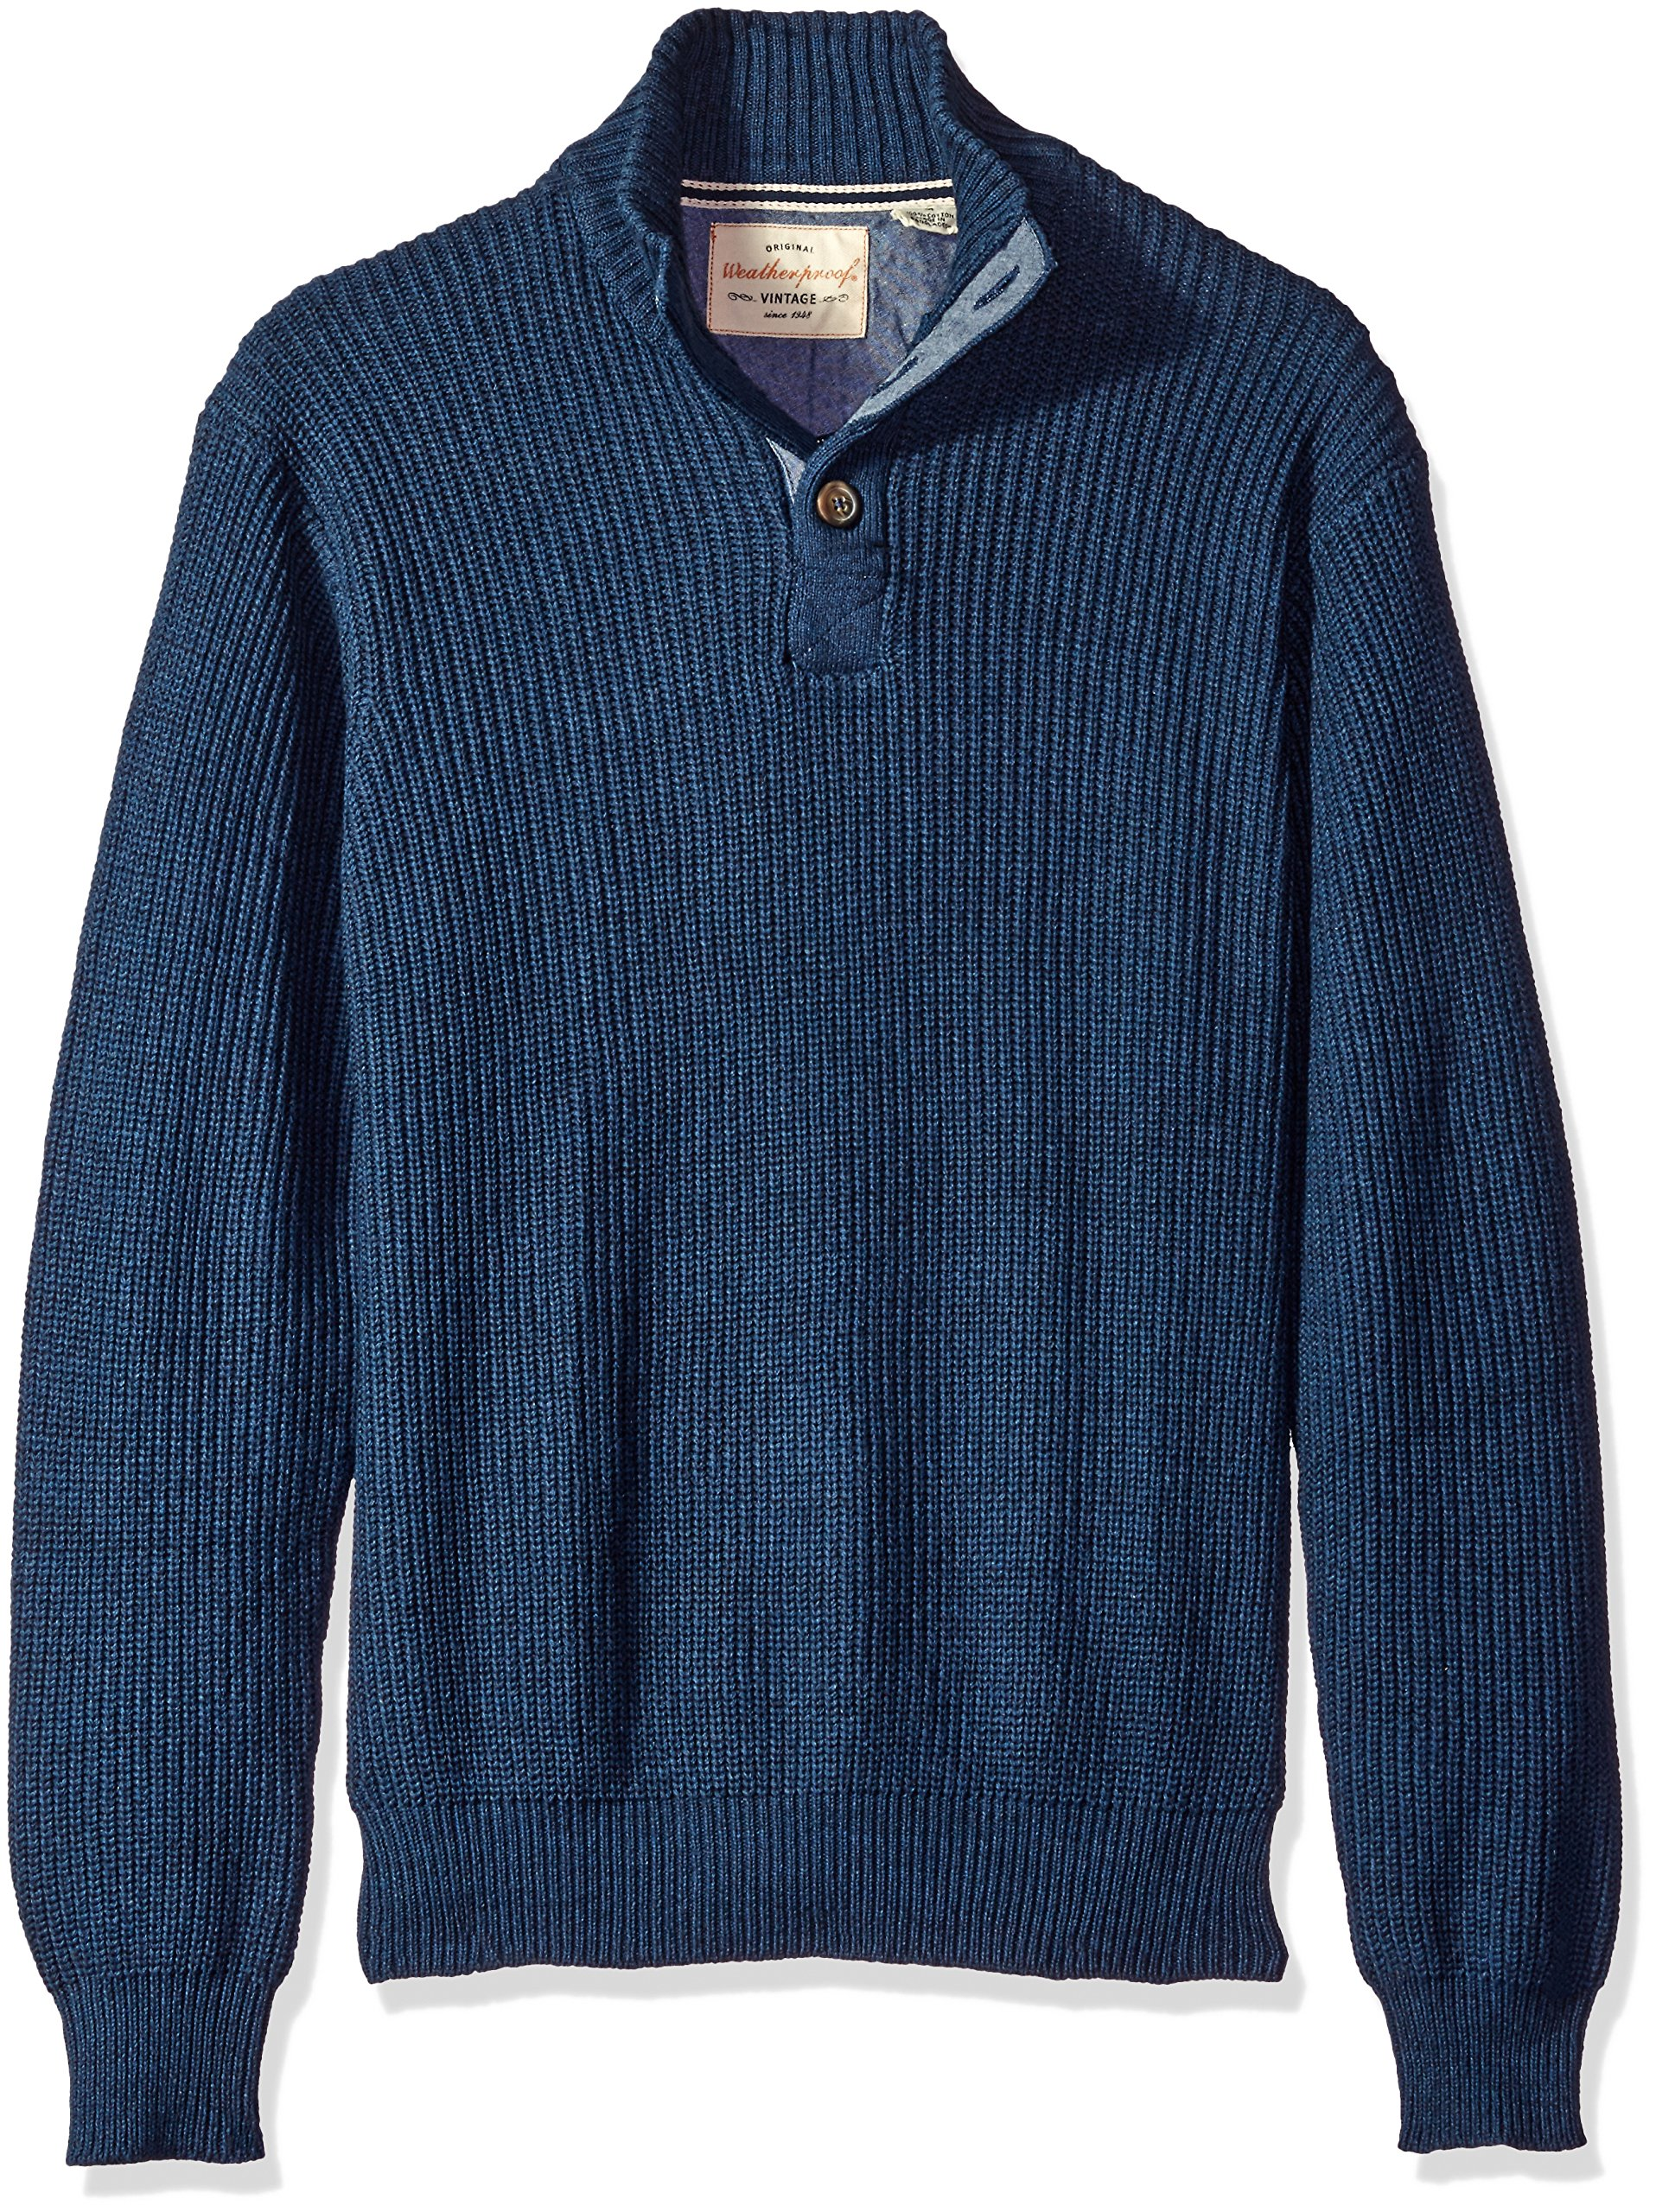 Weatherproof Vintage Men's Shaker Button Mock Sweater, Dark Indigo Heather, Small